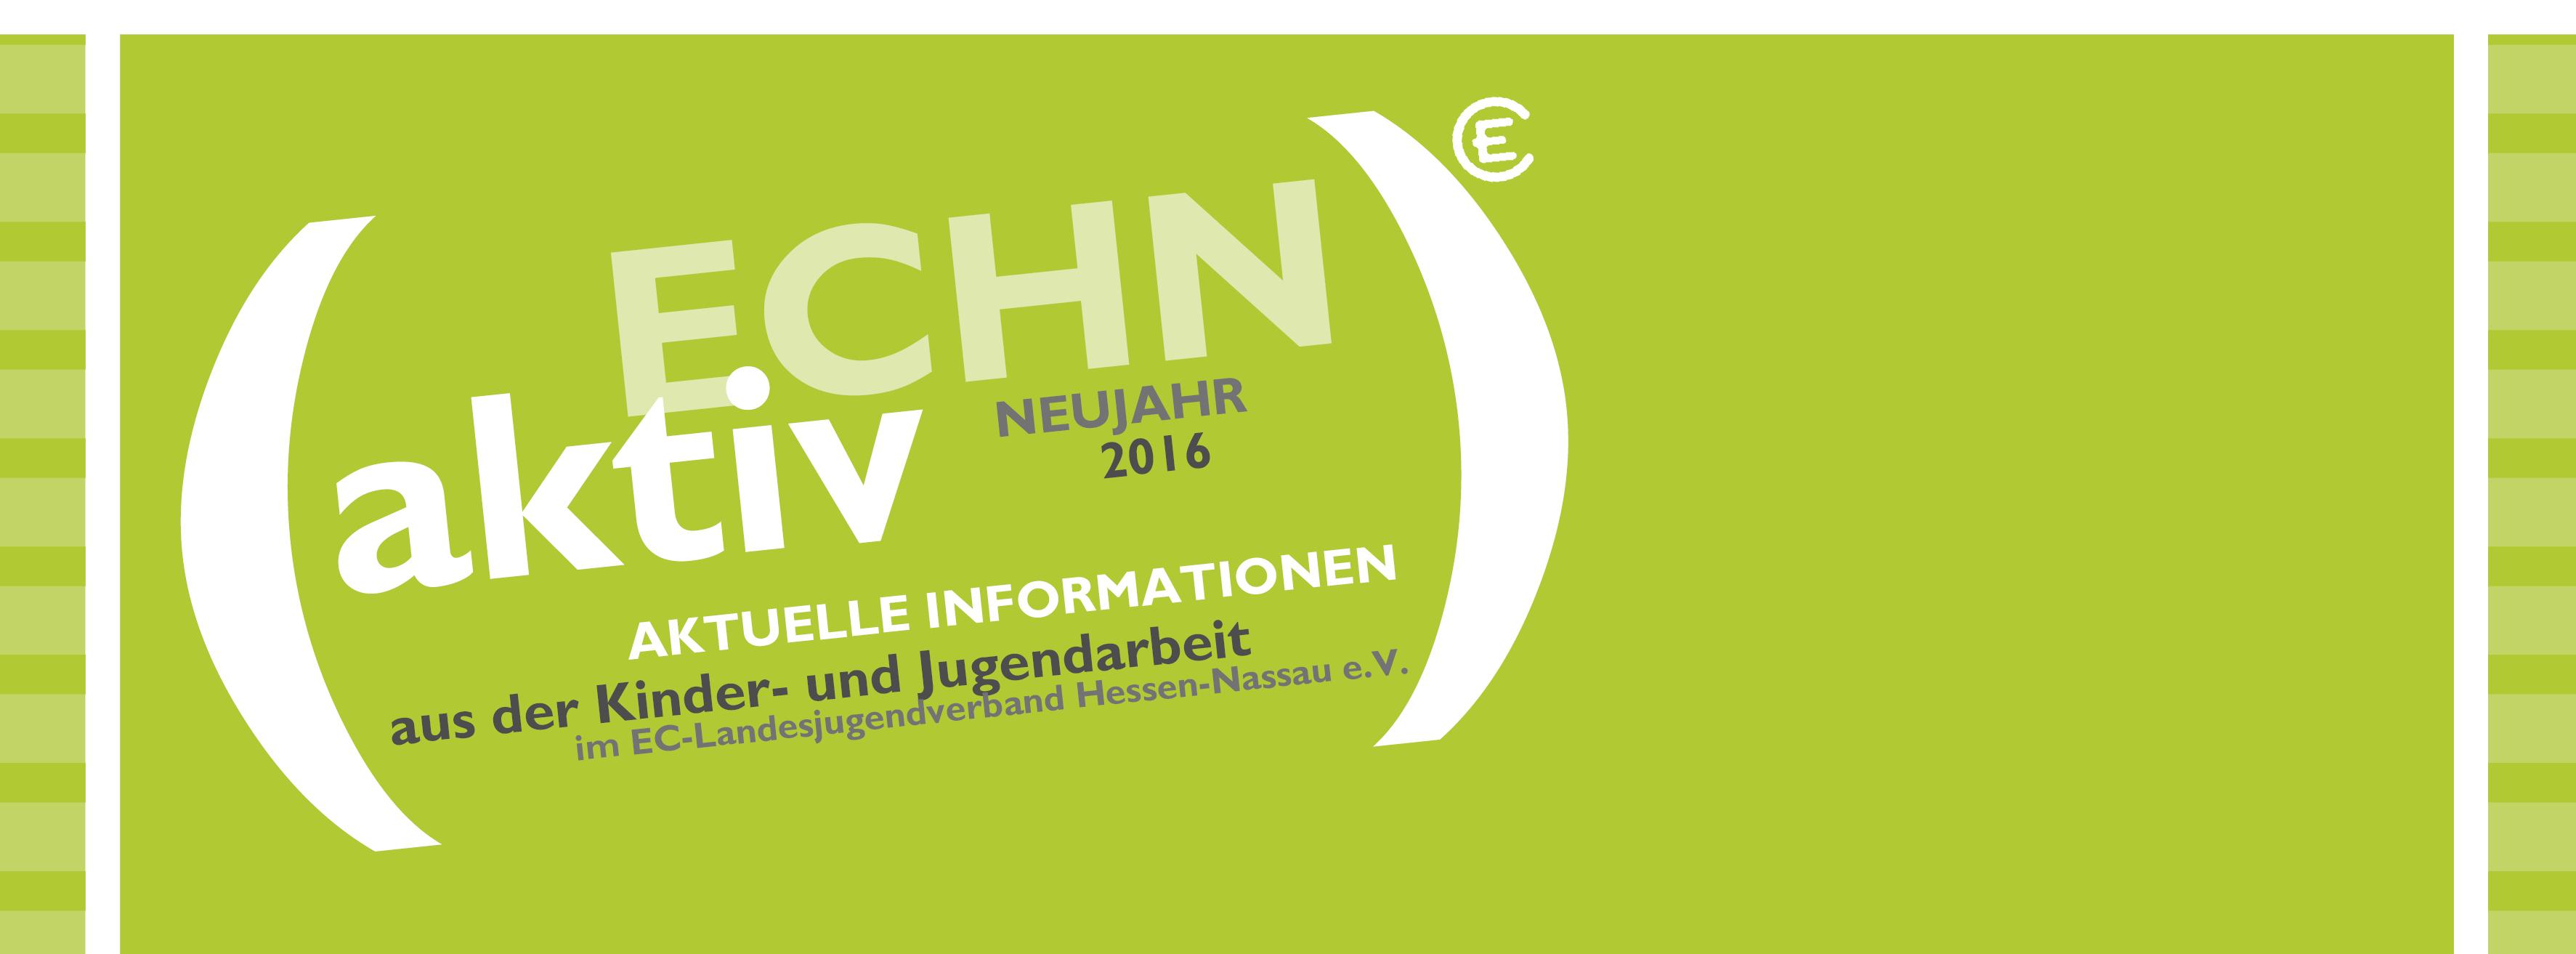 ECHN aktiv Neujahr